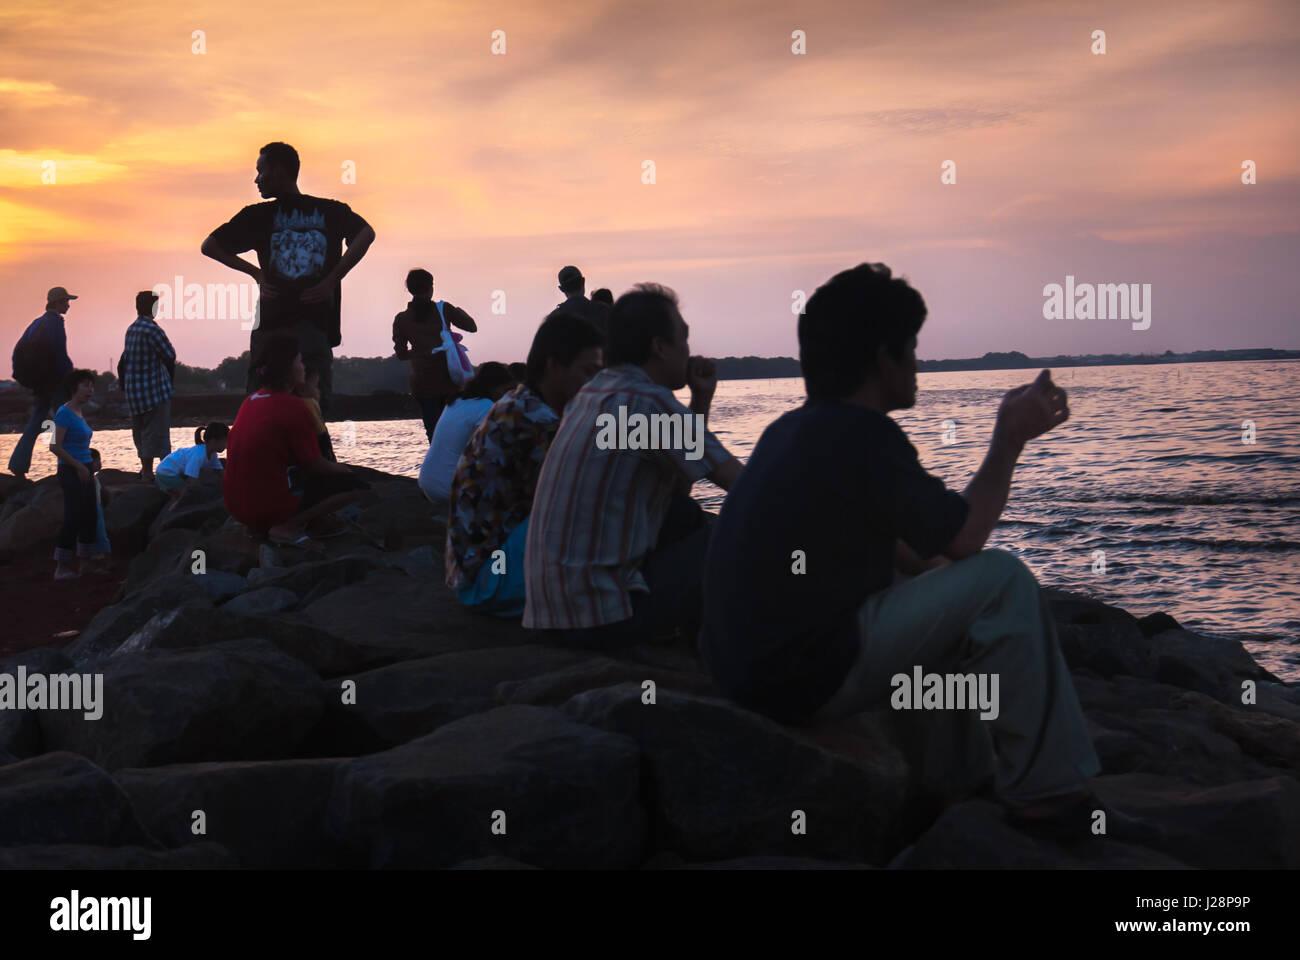 People having leisure time before sunset on the beach of Pantai Indah Kapuk, North Jakarta, Indonesia. © Reynold - Stock Image